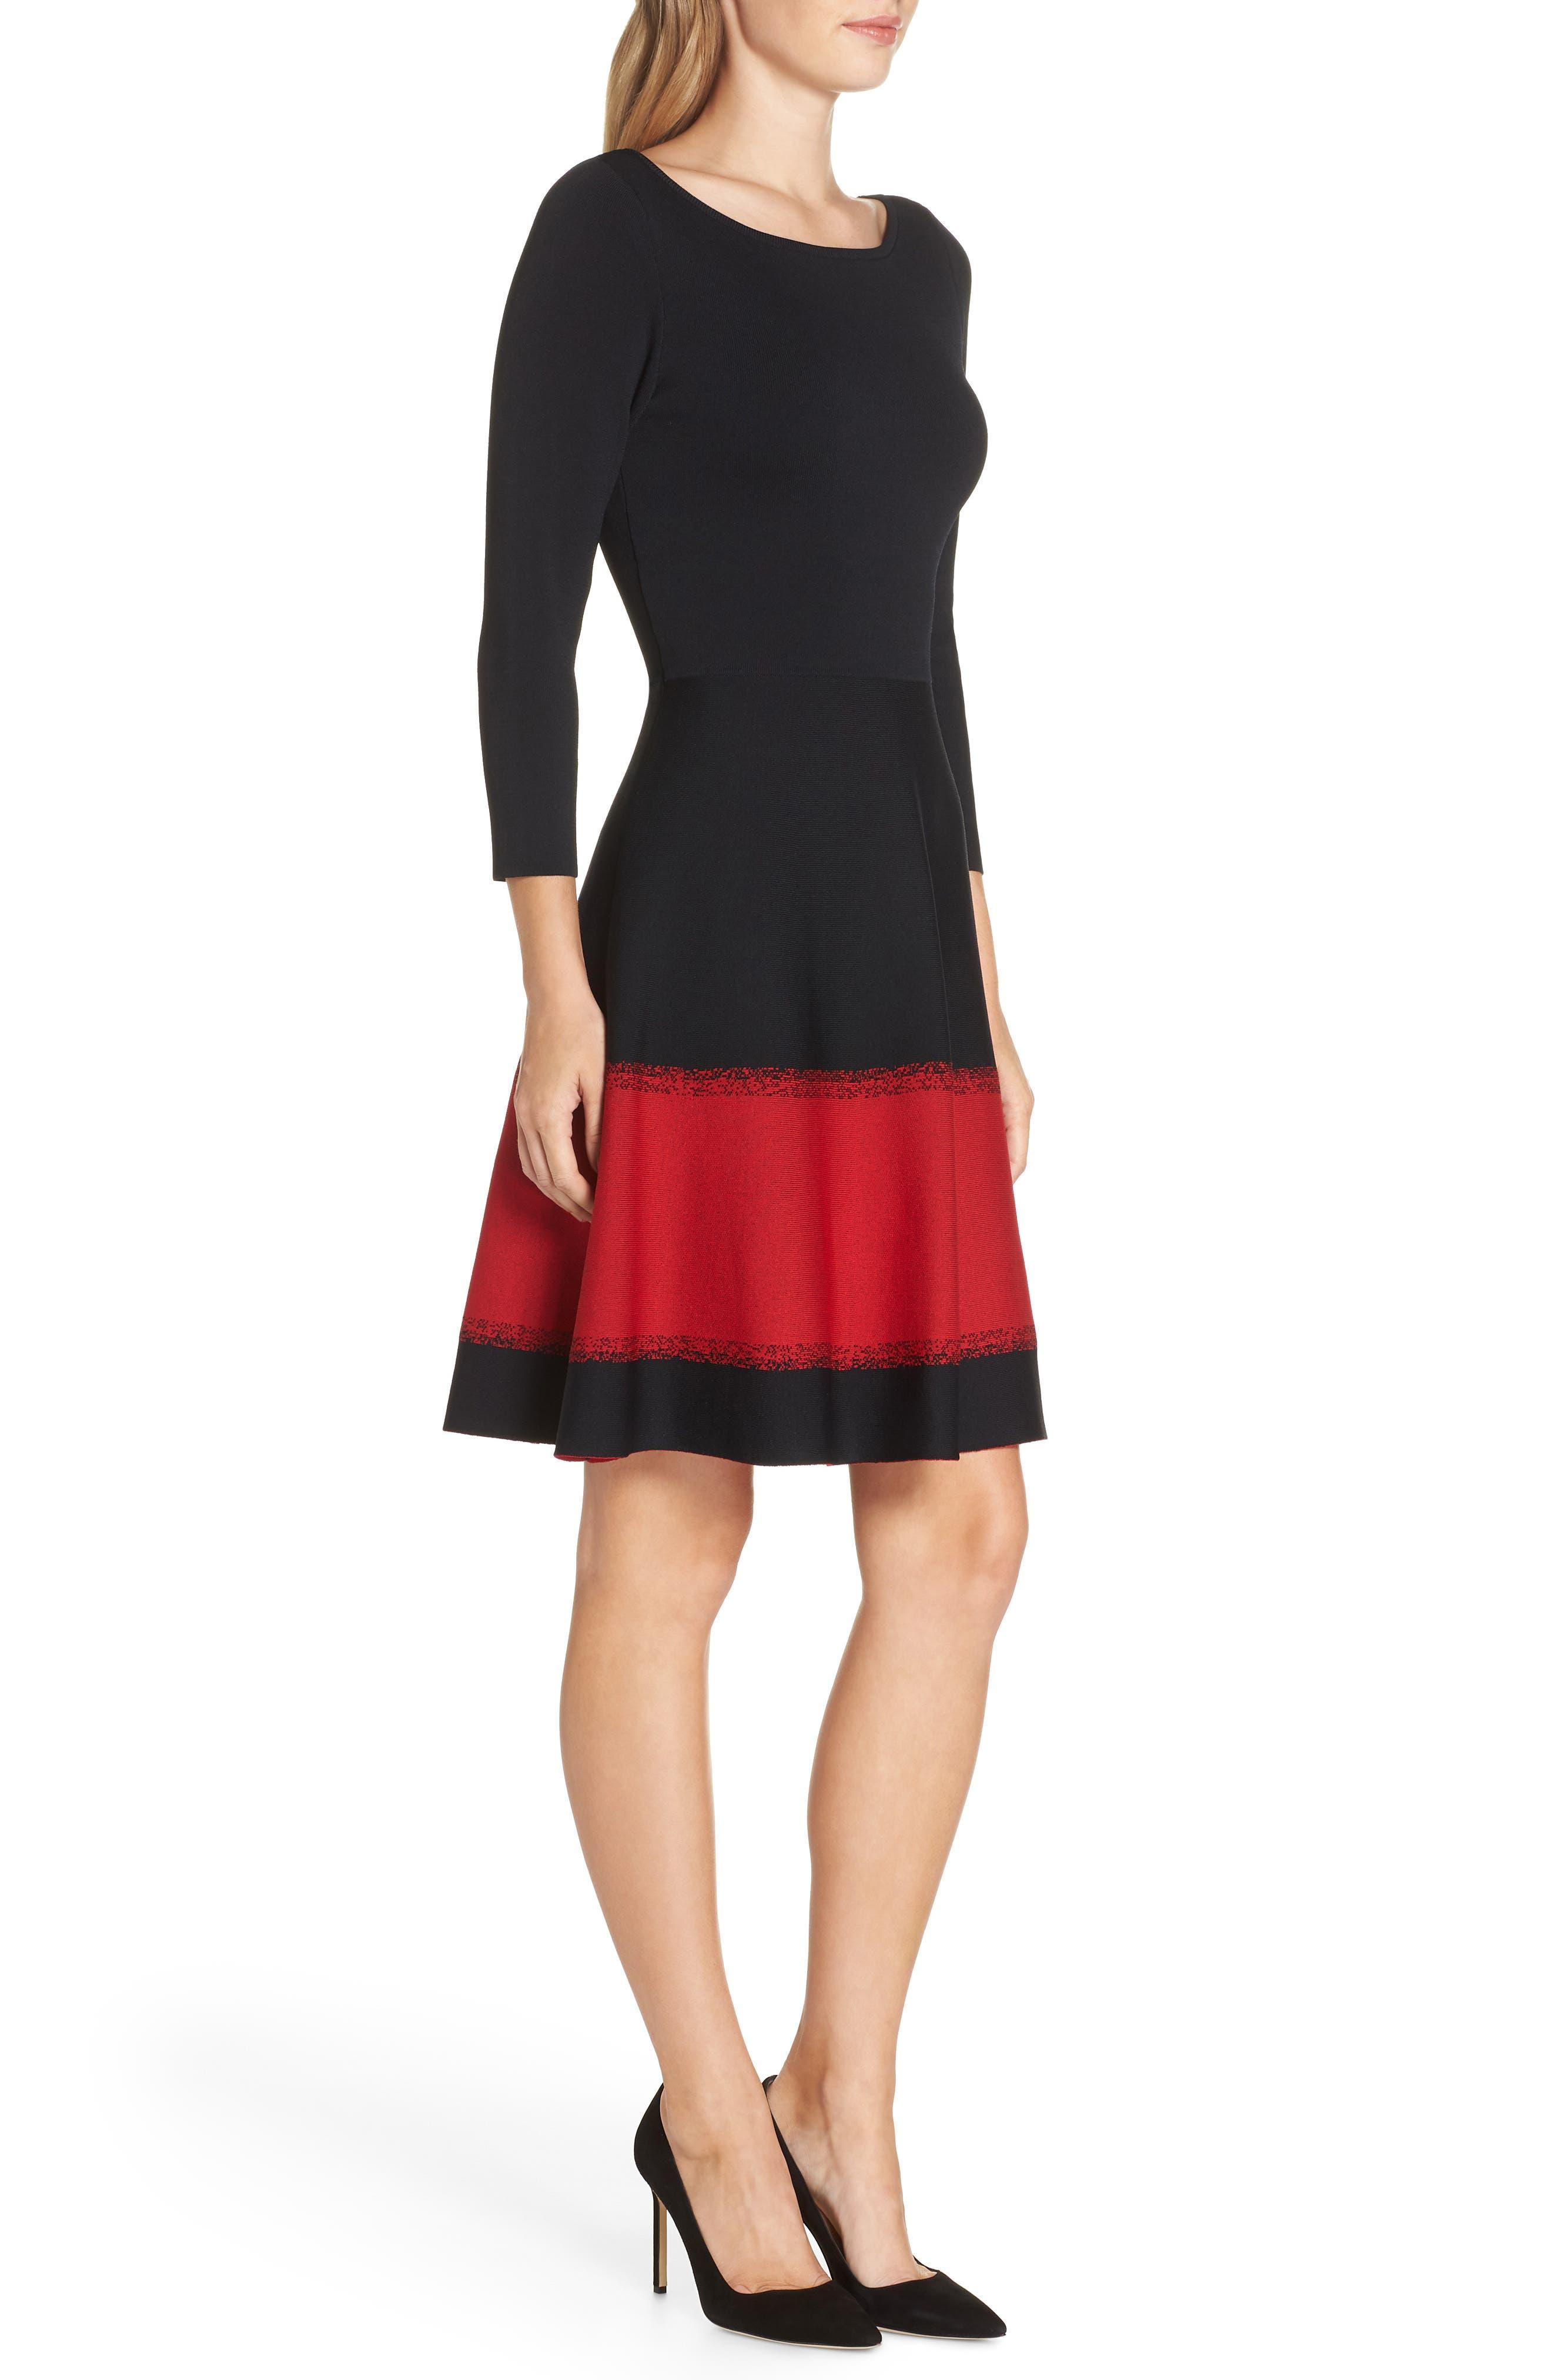 ELIZA J, Contrast Stripe Fit & Flare Dress, Alternate thumbnail 4, color, 001